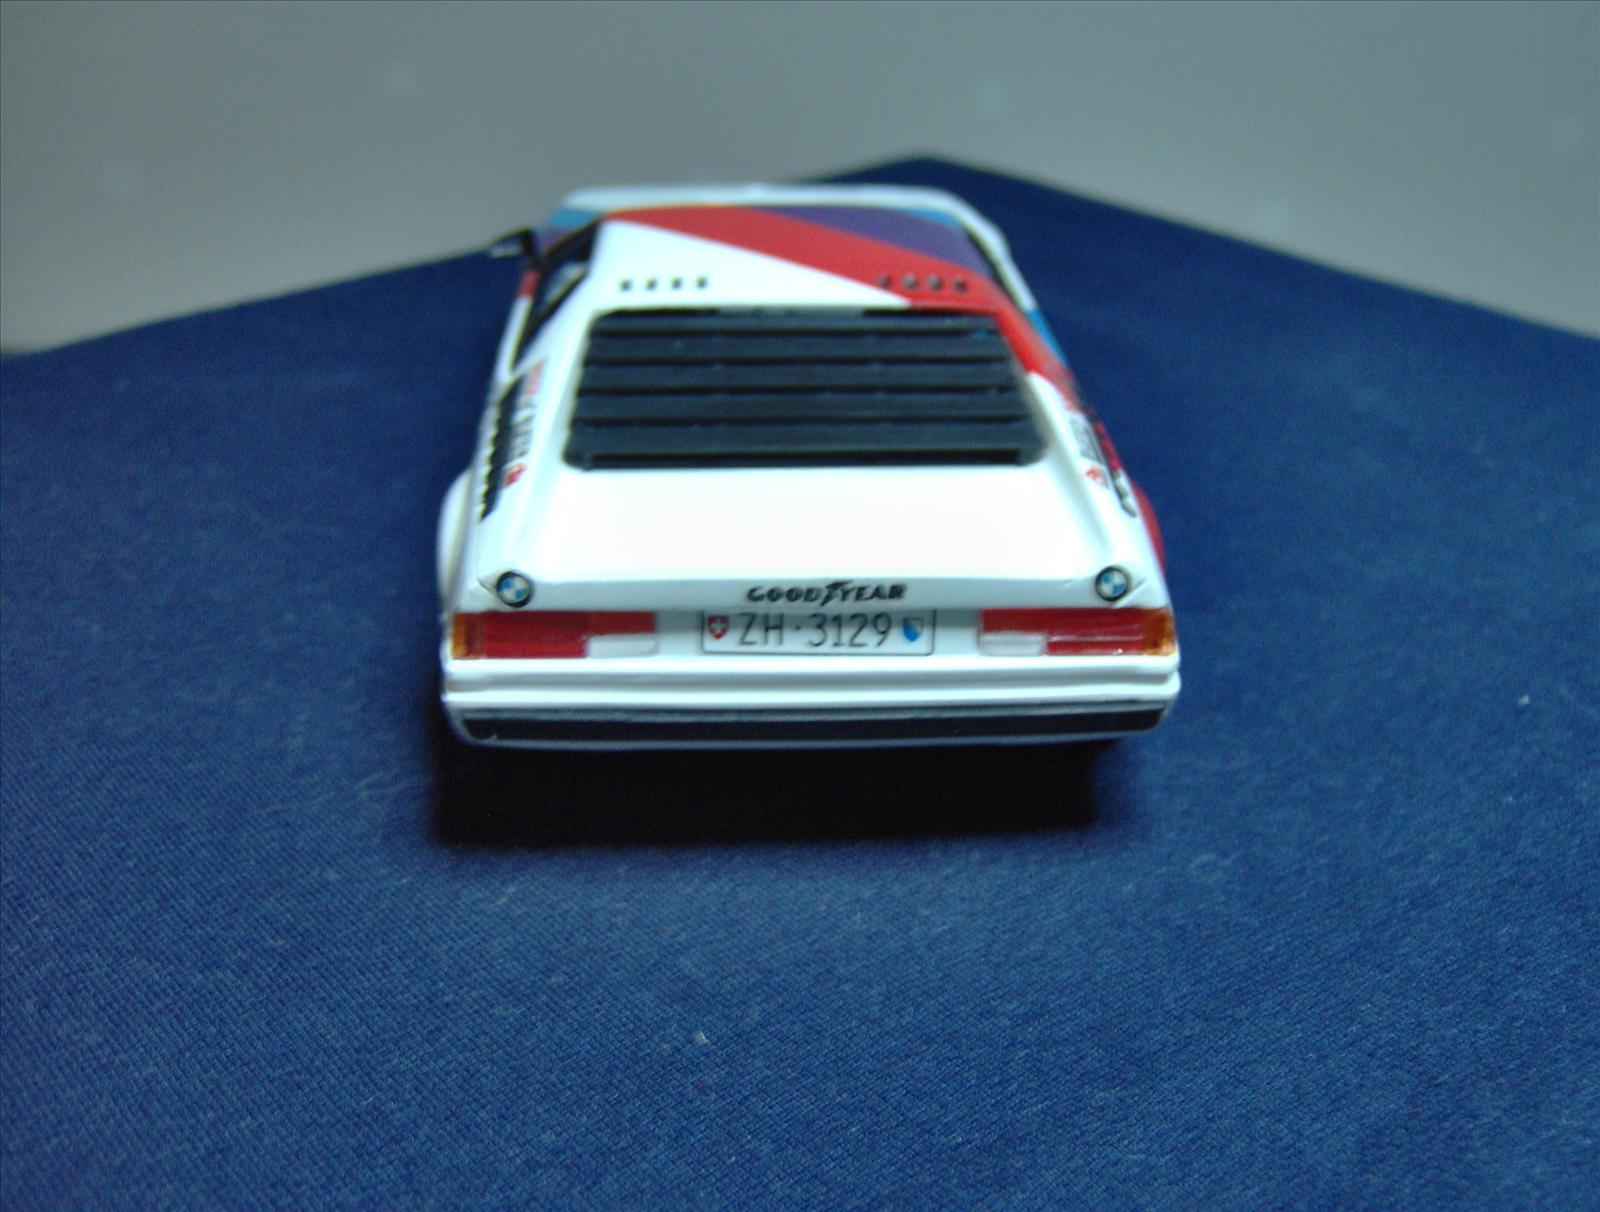 GB 16: BMW m1